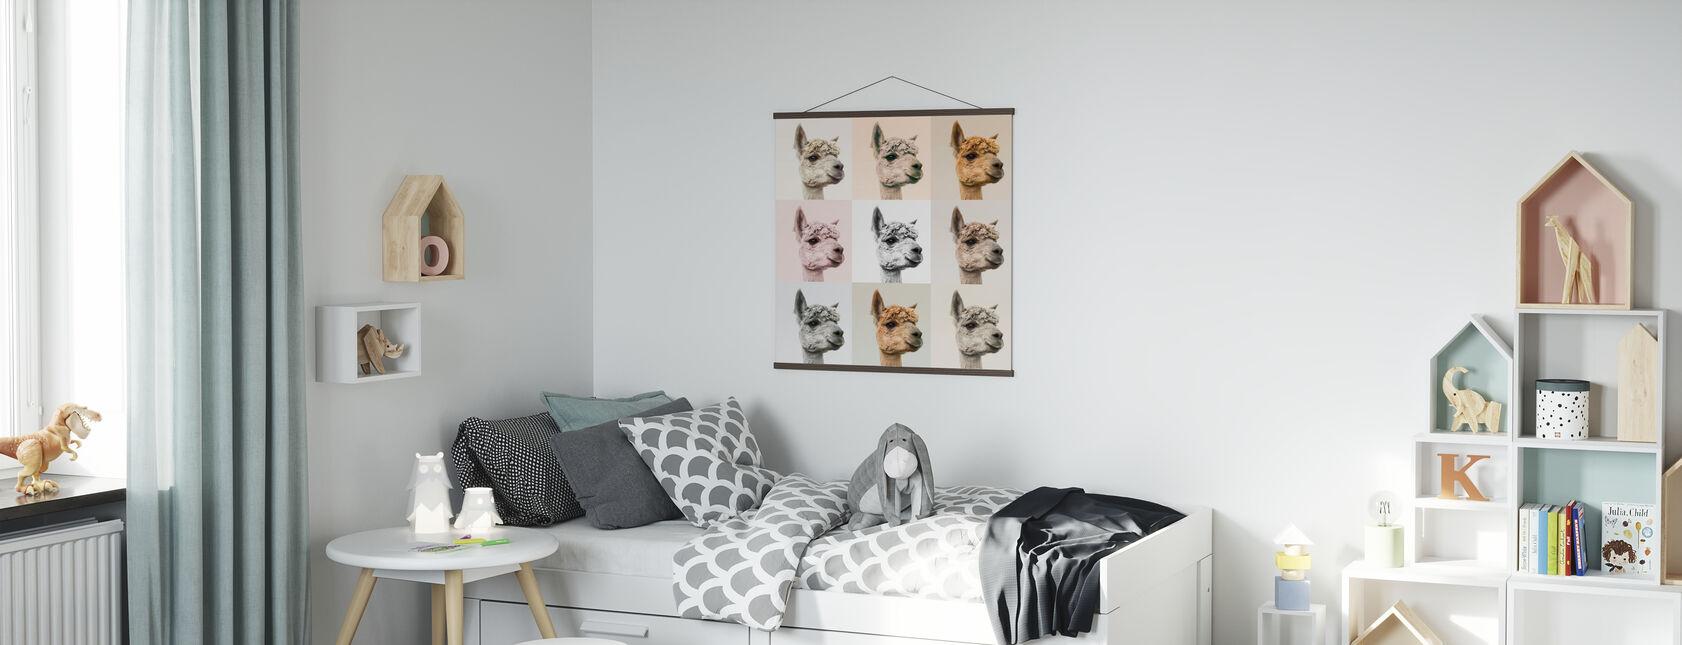 Alpaca e Alcapas - Poster - Camera dei bambini